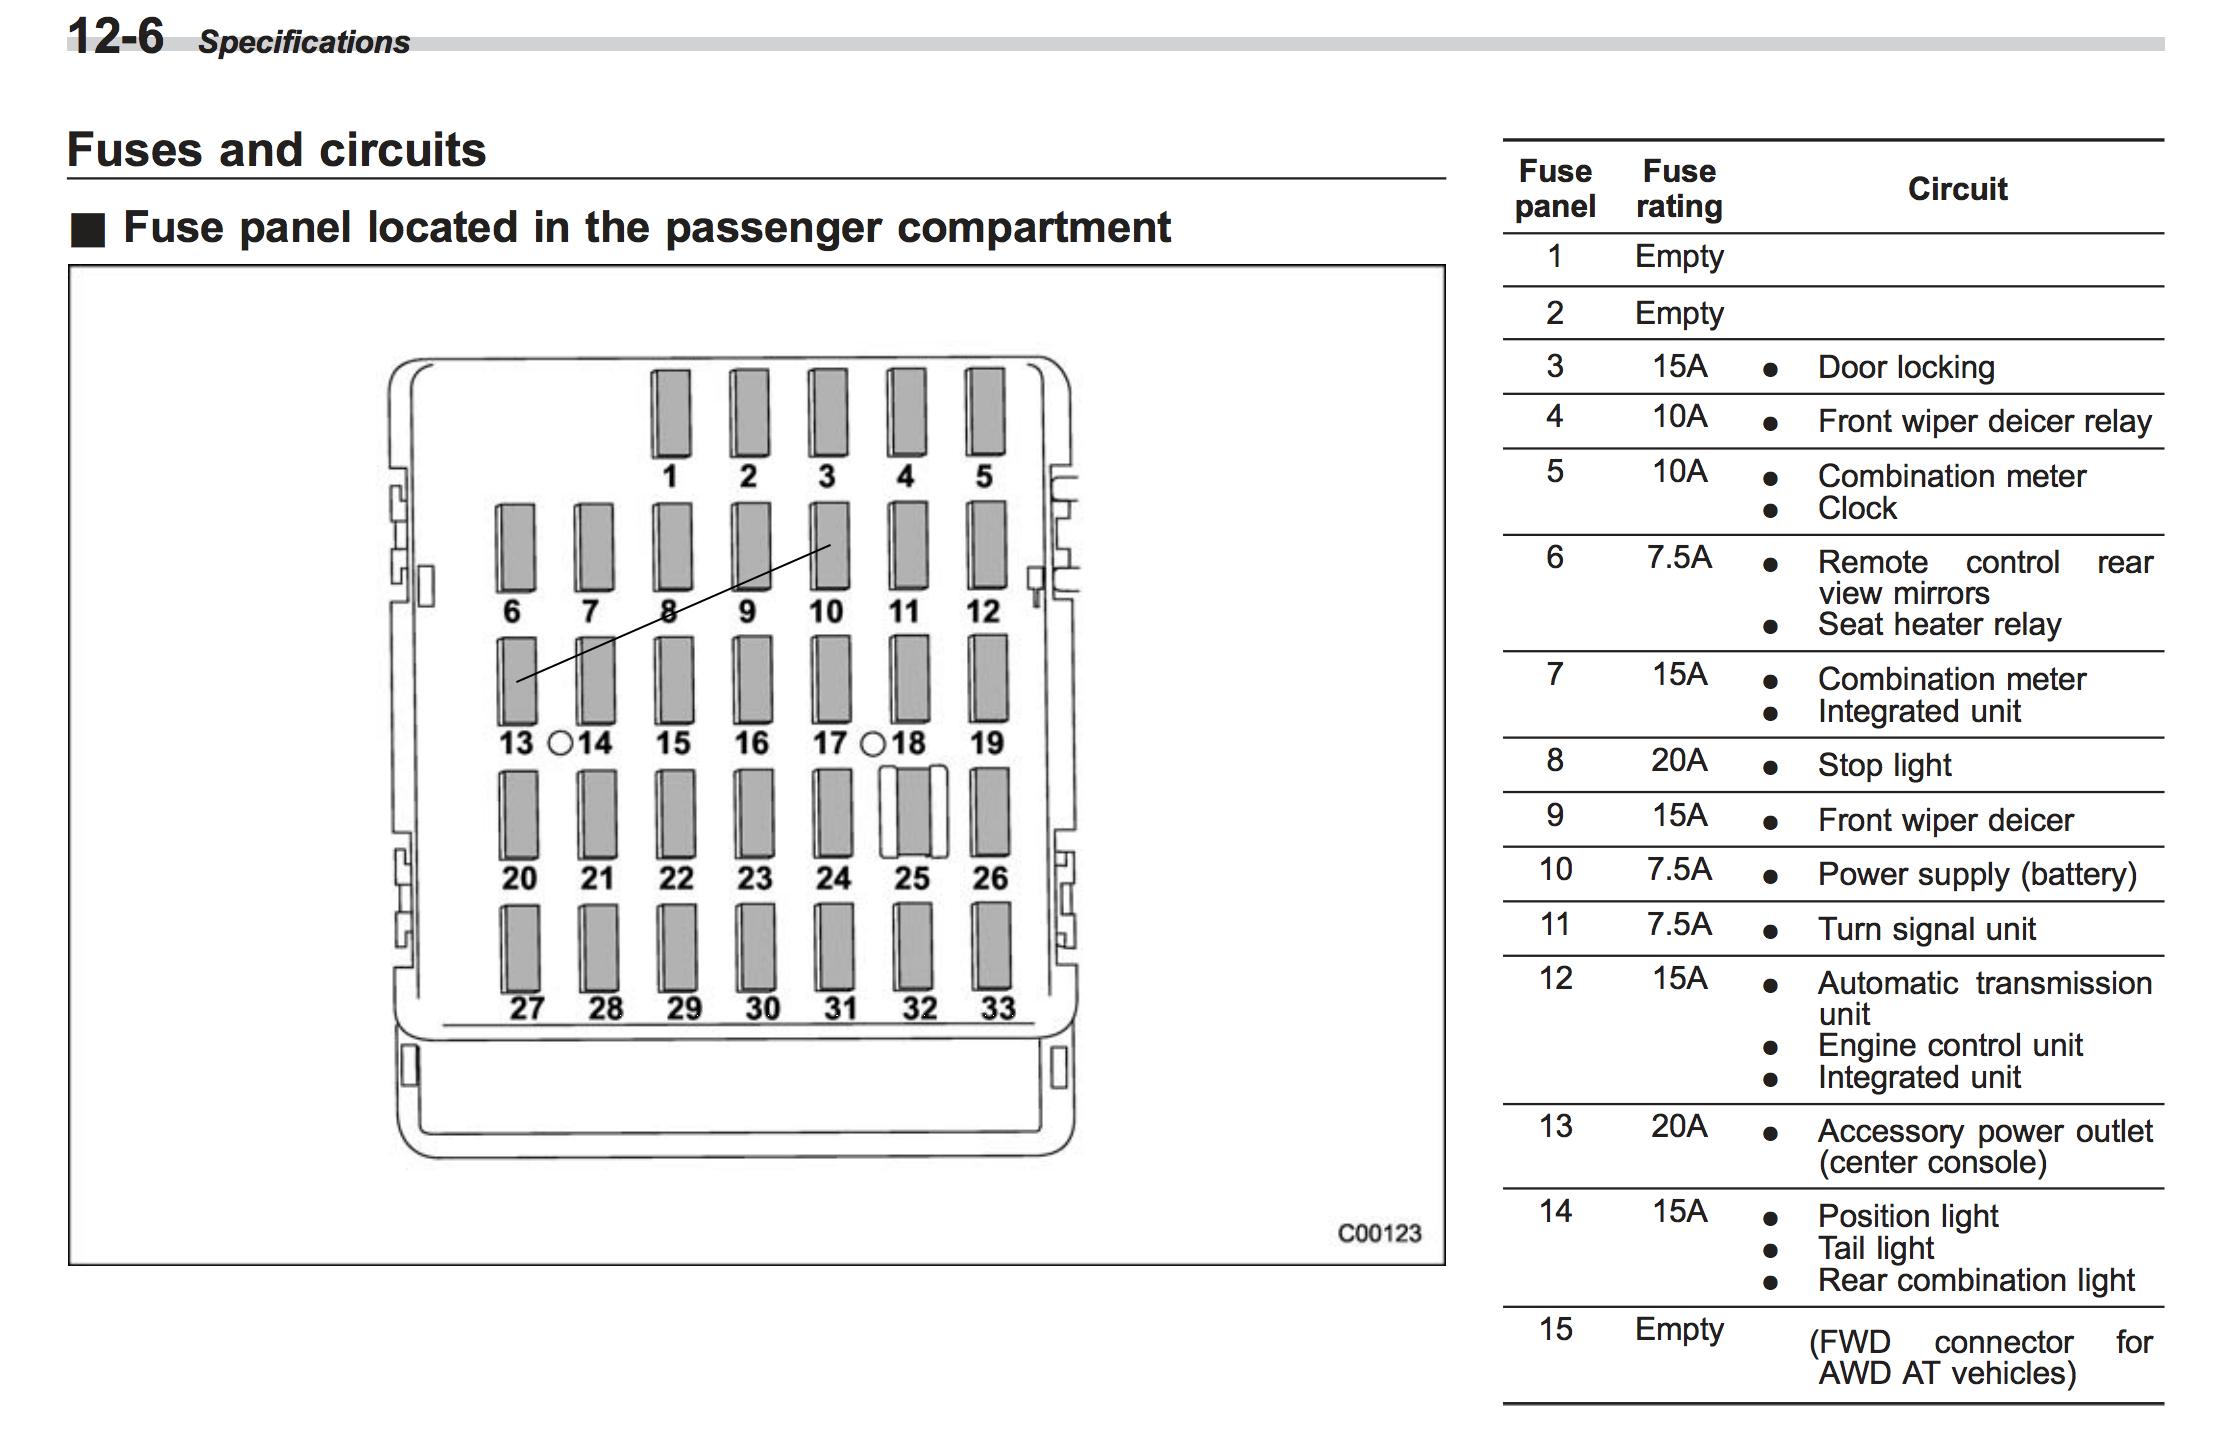 03 Subaru Forester Fuse Box - Wiring Diagram All drab-paper -  drab-paper.huevoprint.it | 2014 Subaru Forester Fuse Box Diagram |  | Huevoprint